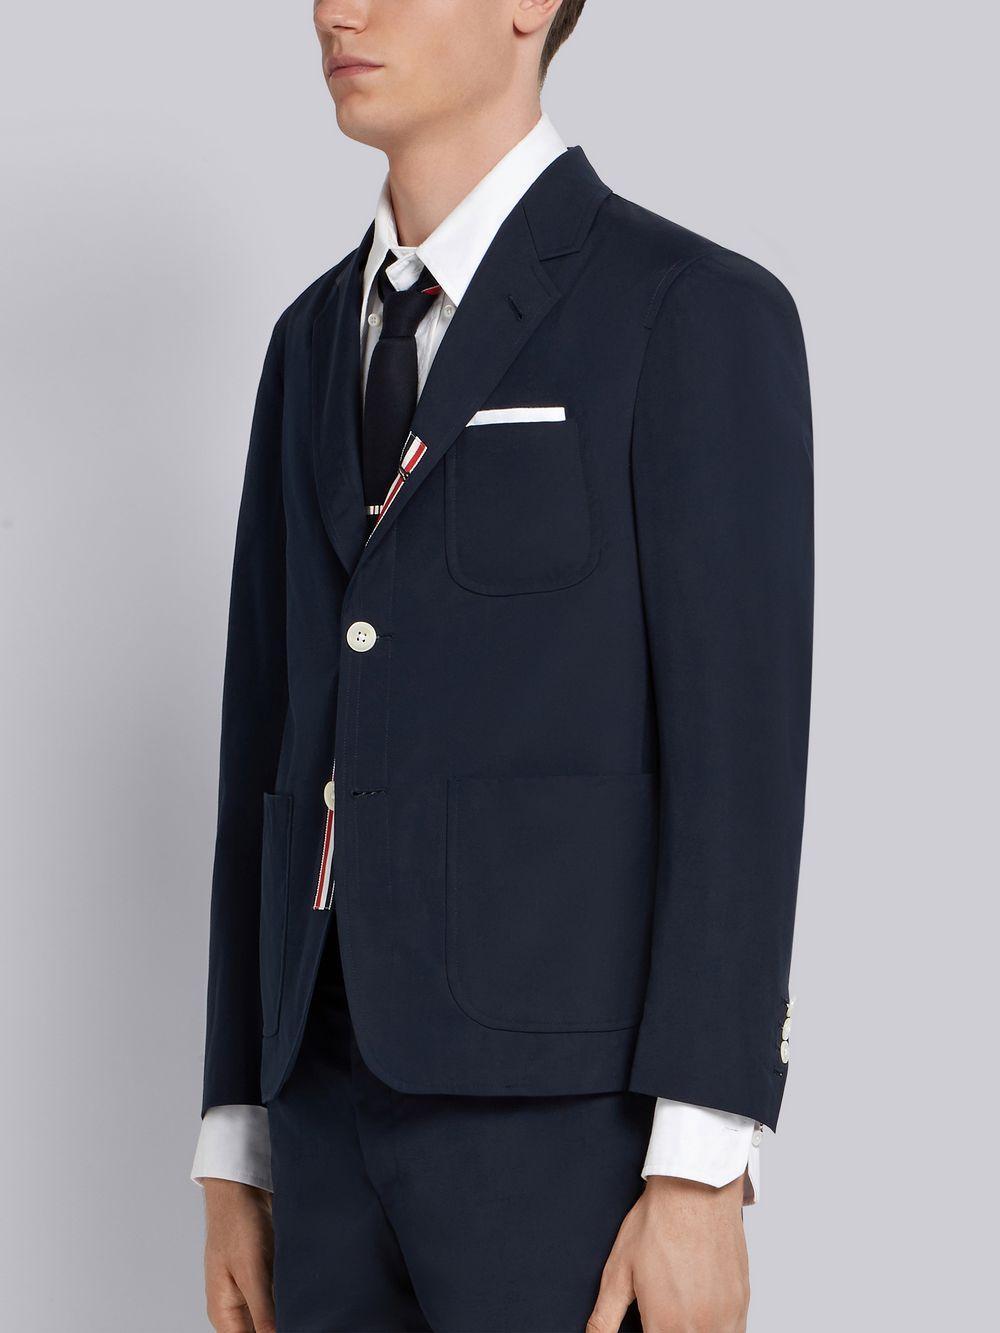 fe37cbab398a Thom Browne - Blue Typewriter Cloth Sack Sport Coat for Men - Lyst. View  fullscreen